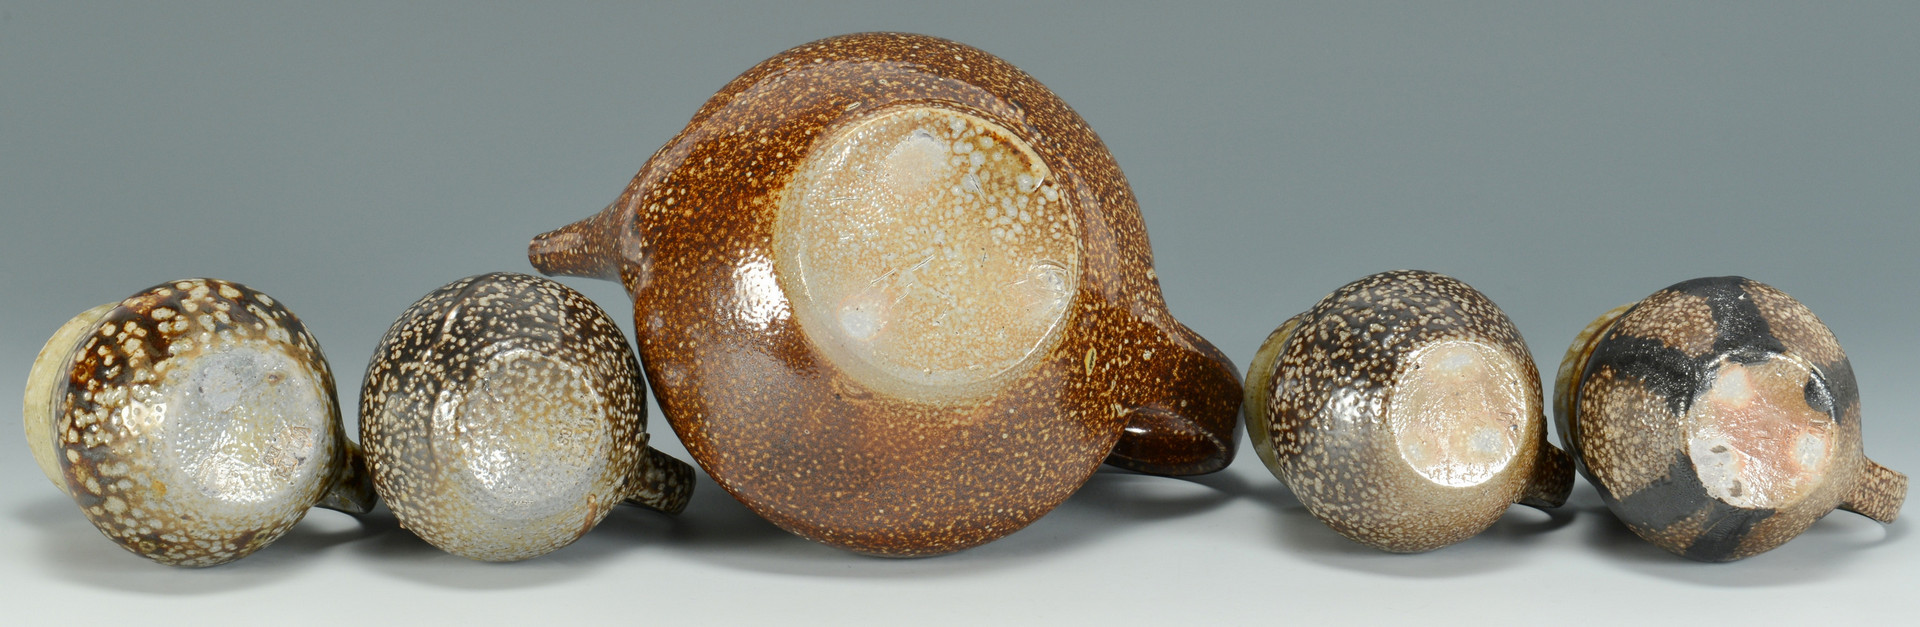 Lot 572: Grouping 6 Mark Hewitt Pottery Items